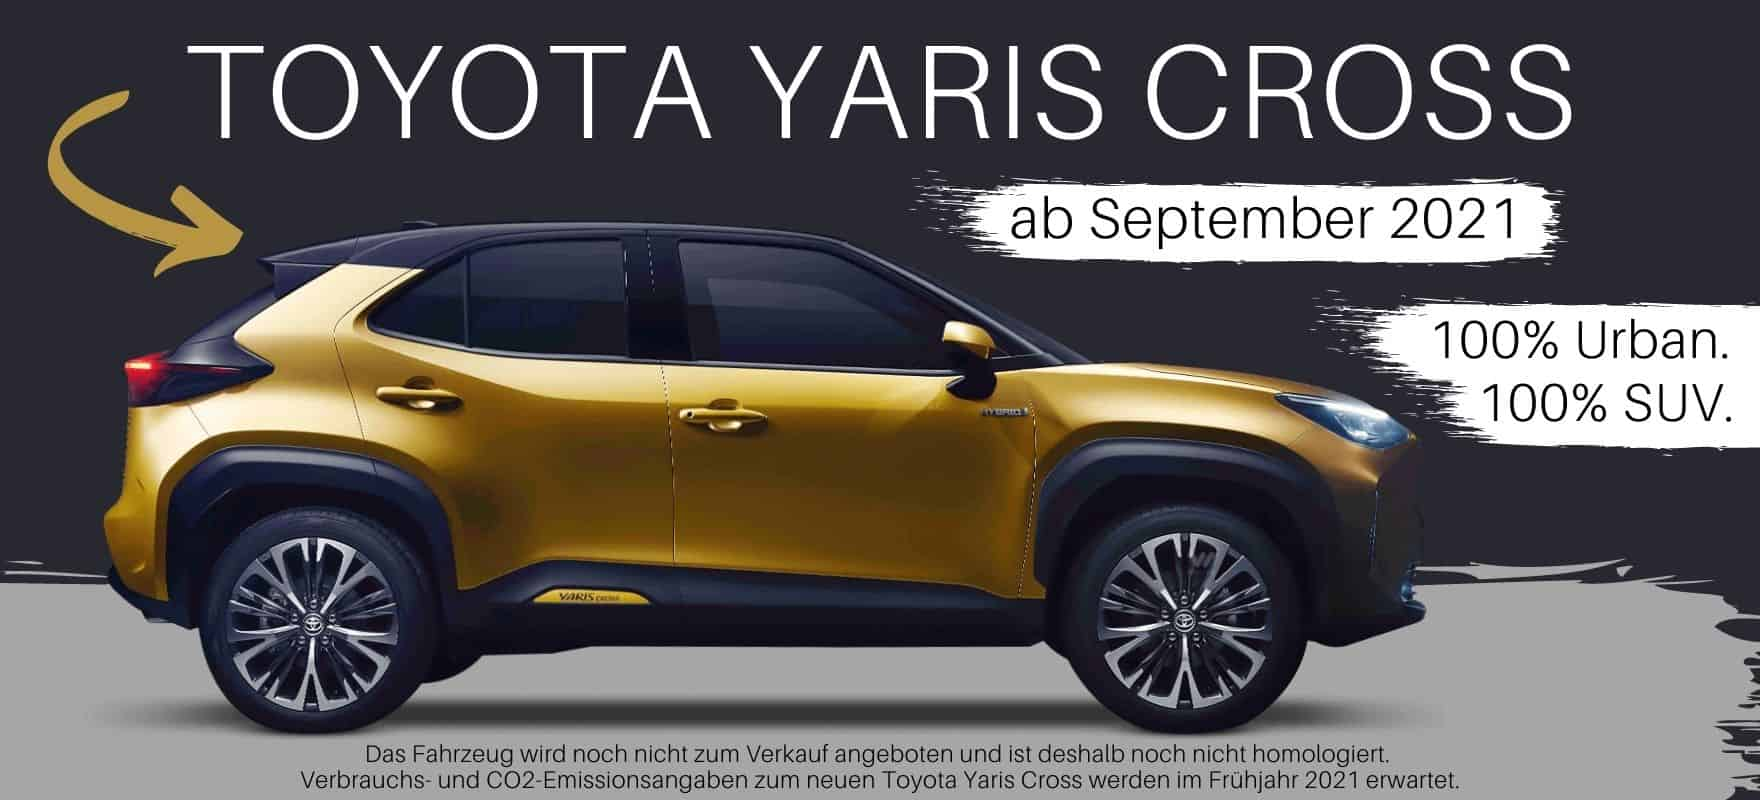 Toyota Yaris Cross SUV im Autohaus Metzger in Widdern bei Heilbronn